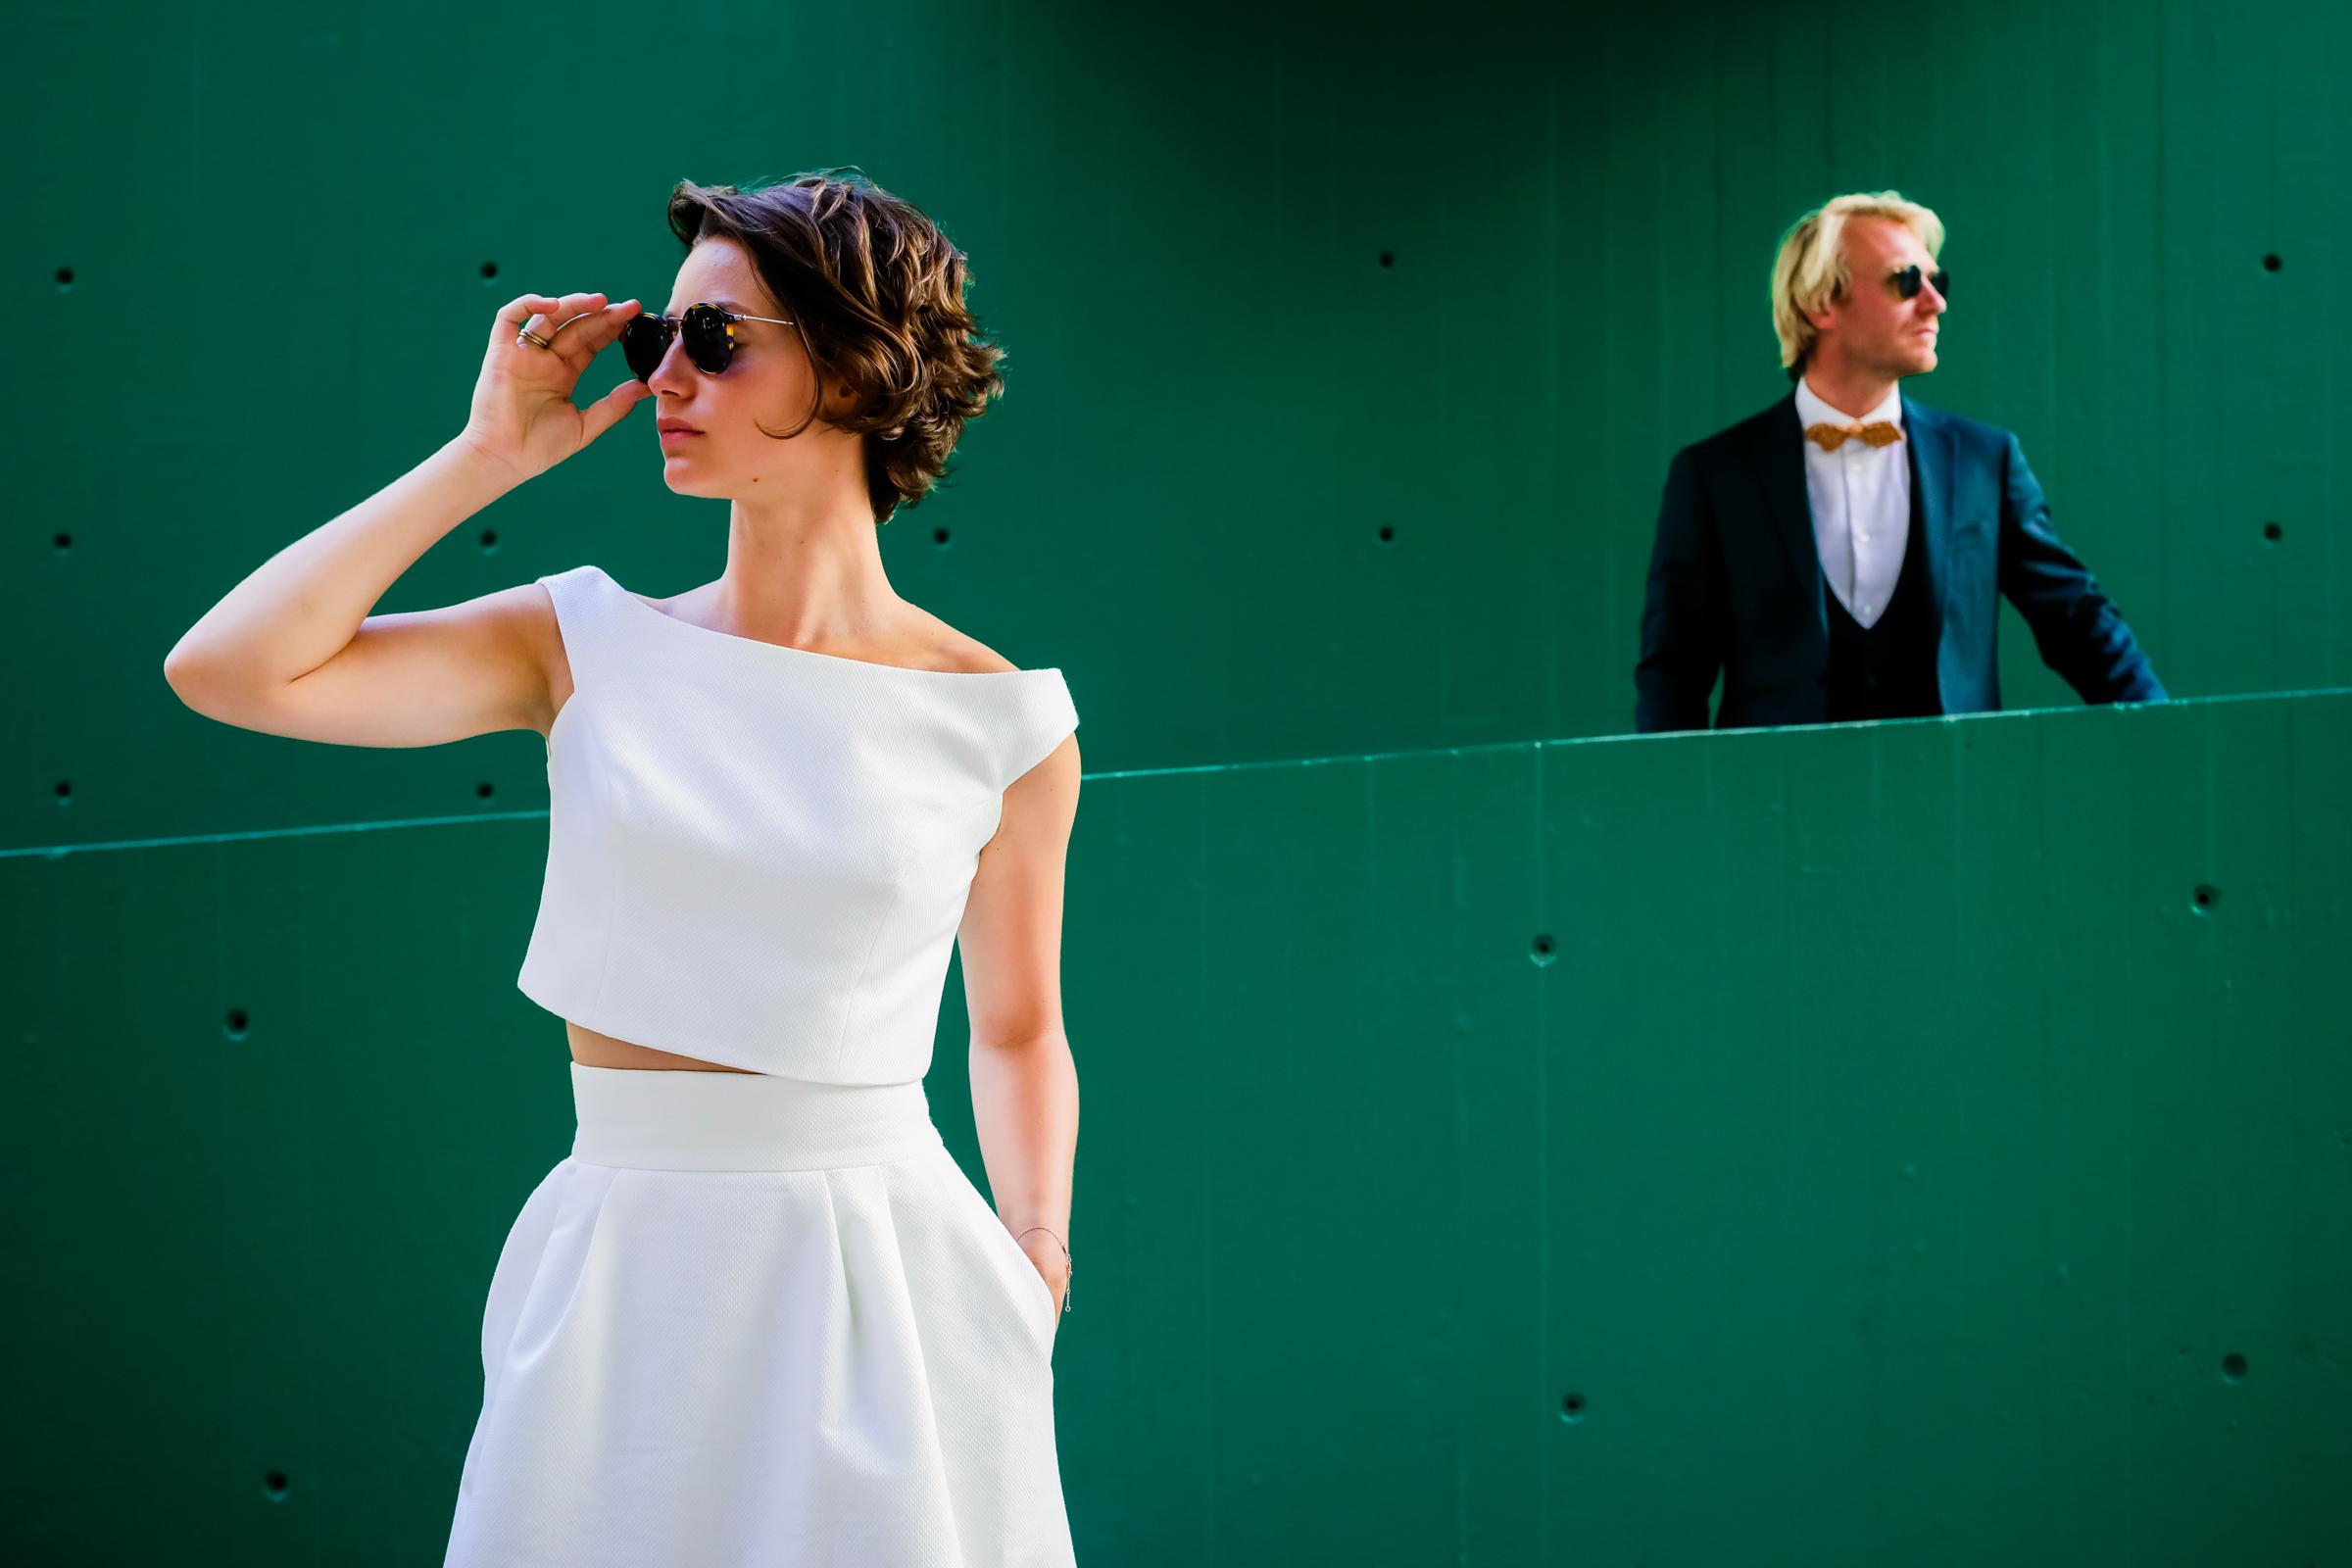 stylish-couple-pose-against-green-walls-julien-laurent-georges